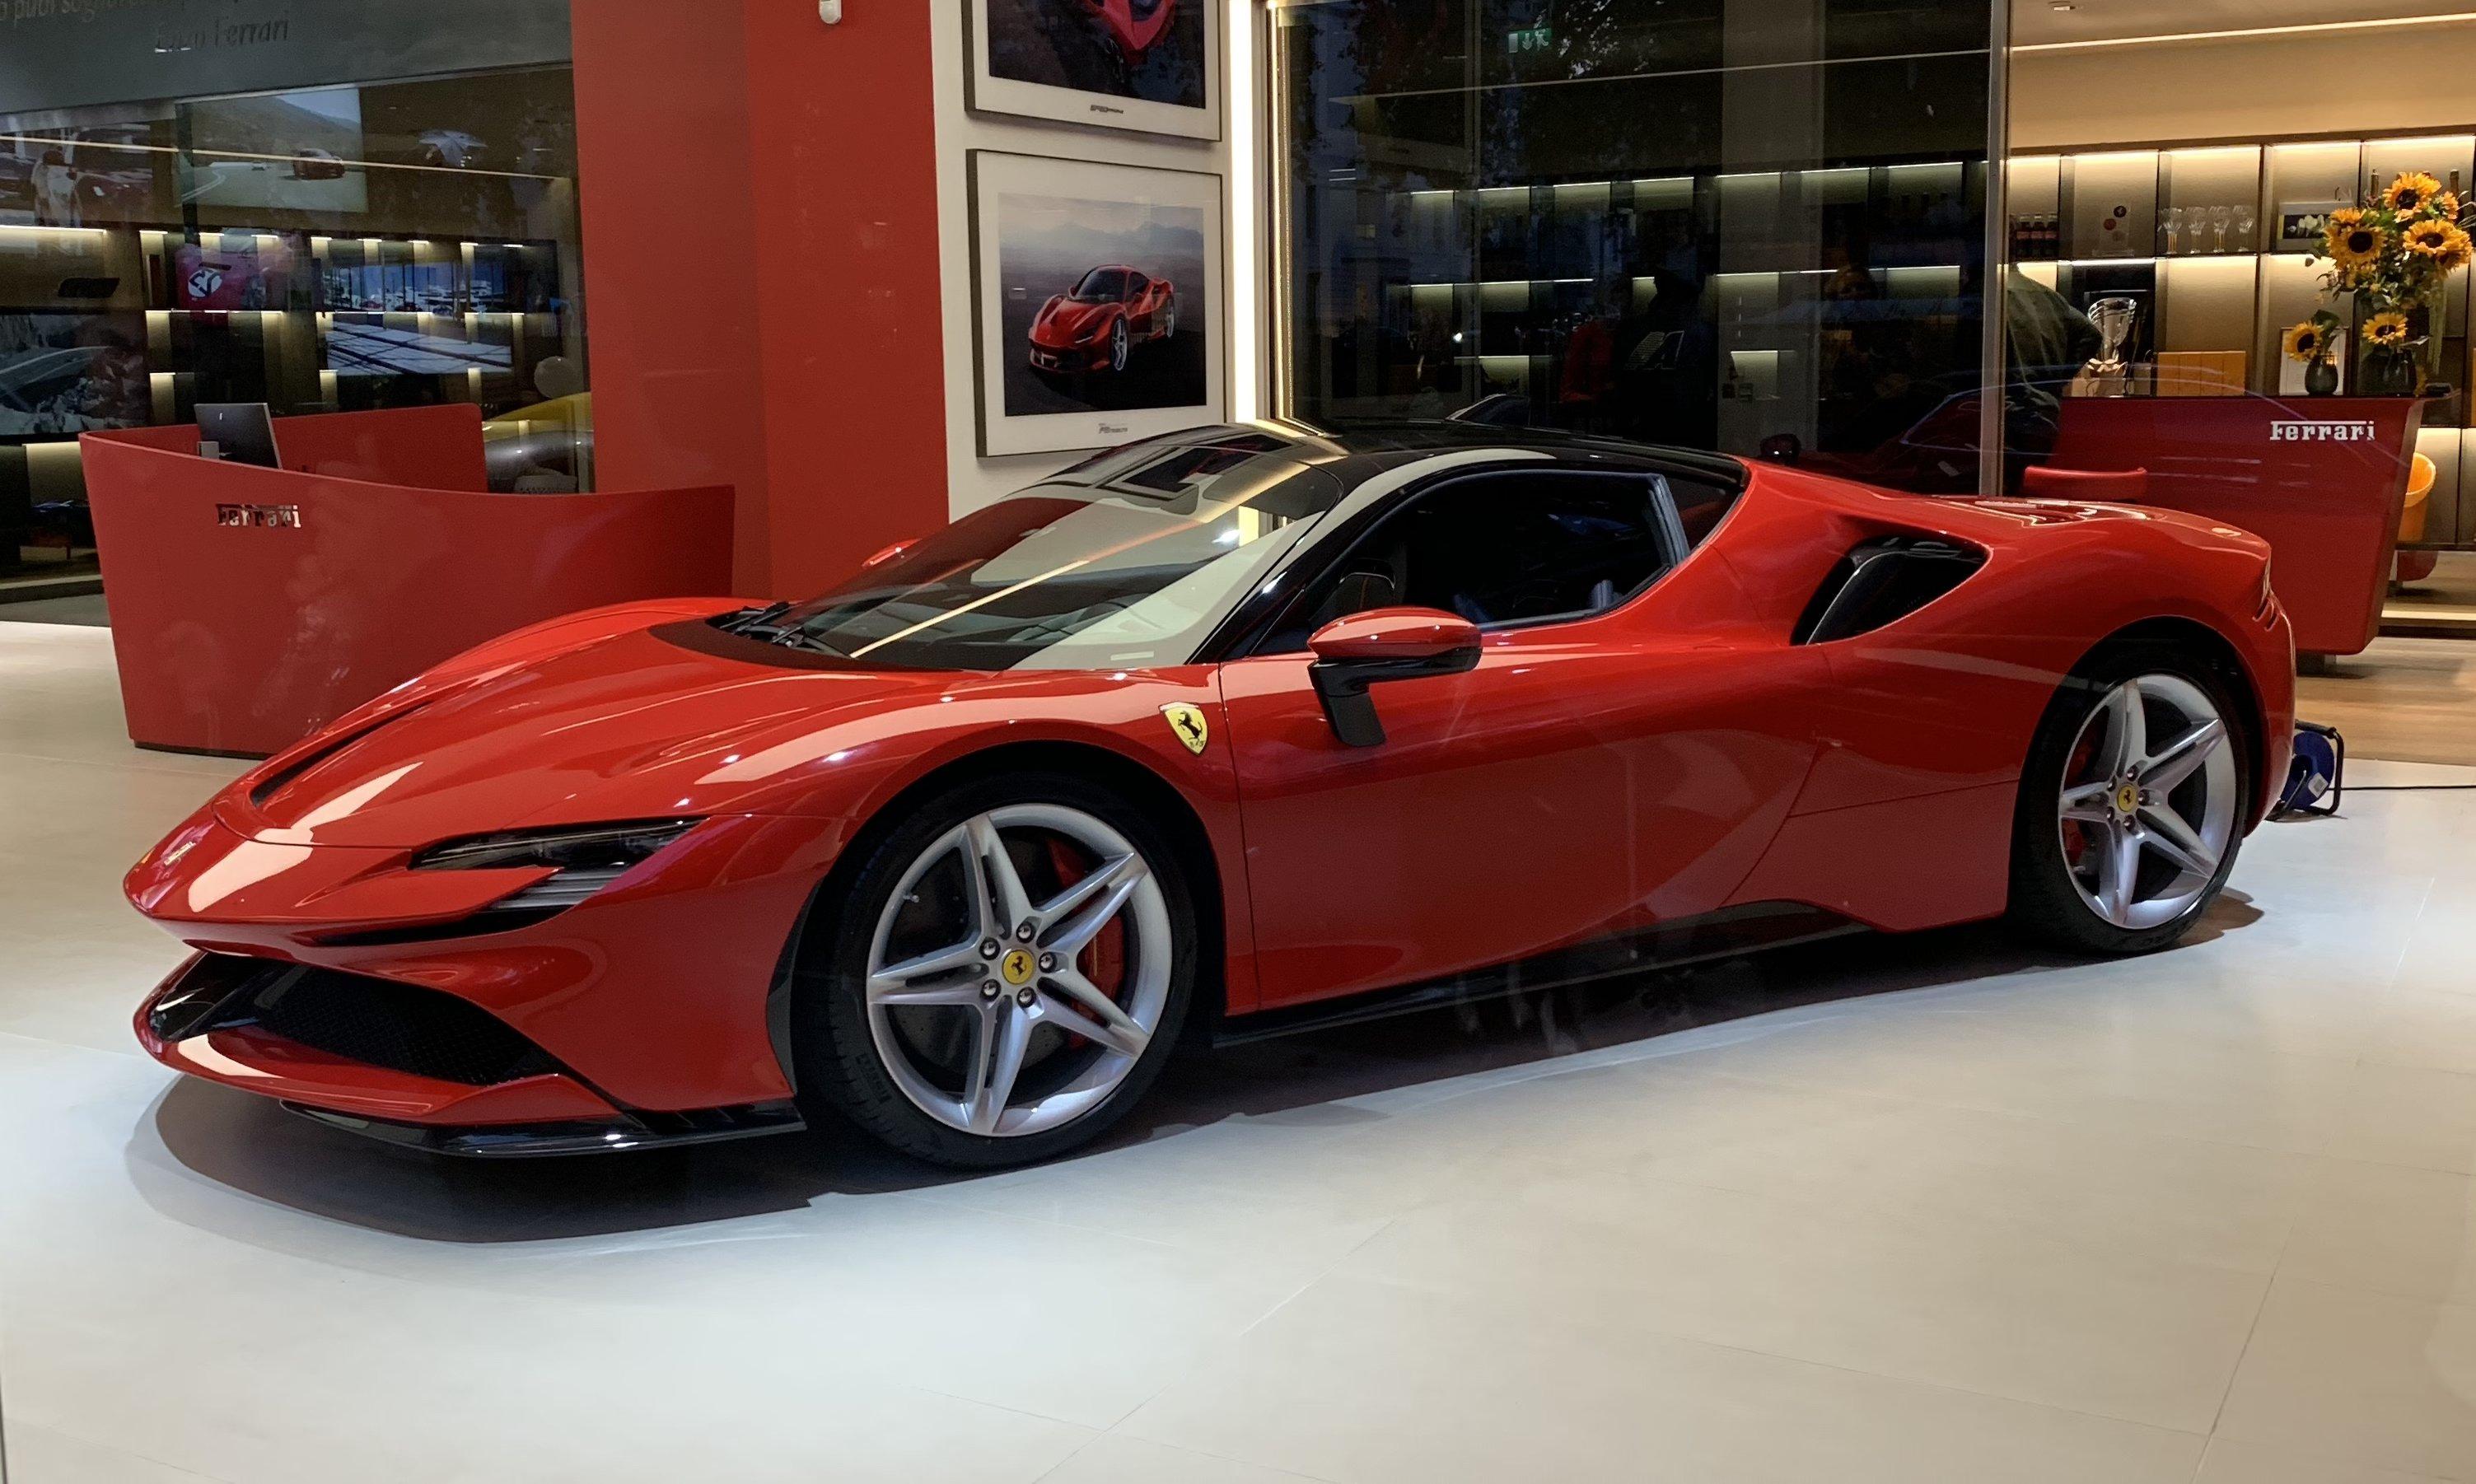 Image Result For Ferrari Cost